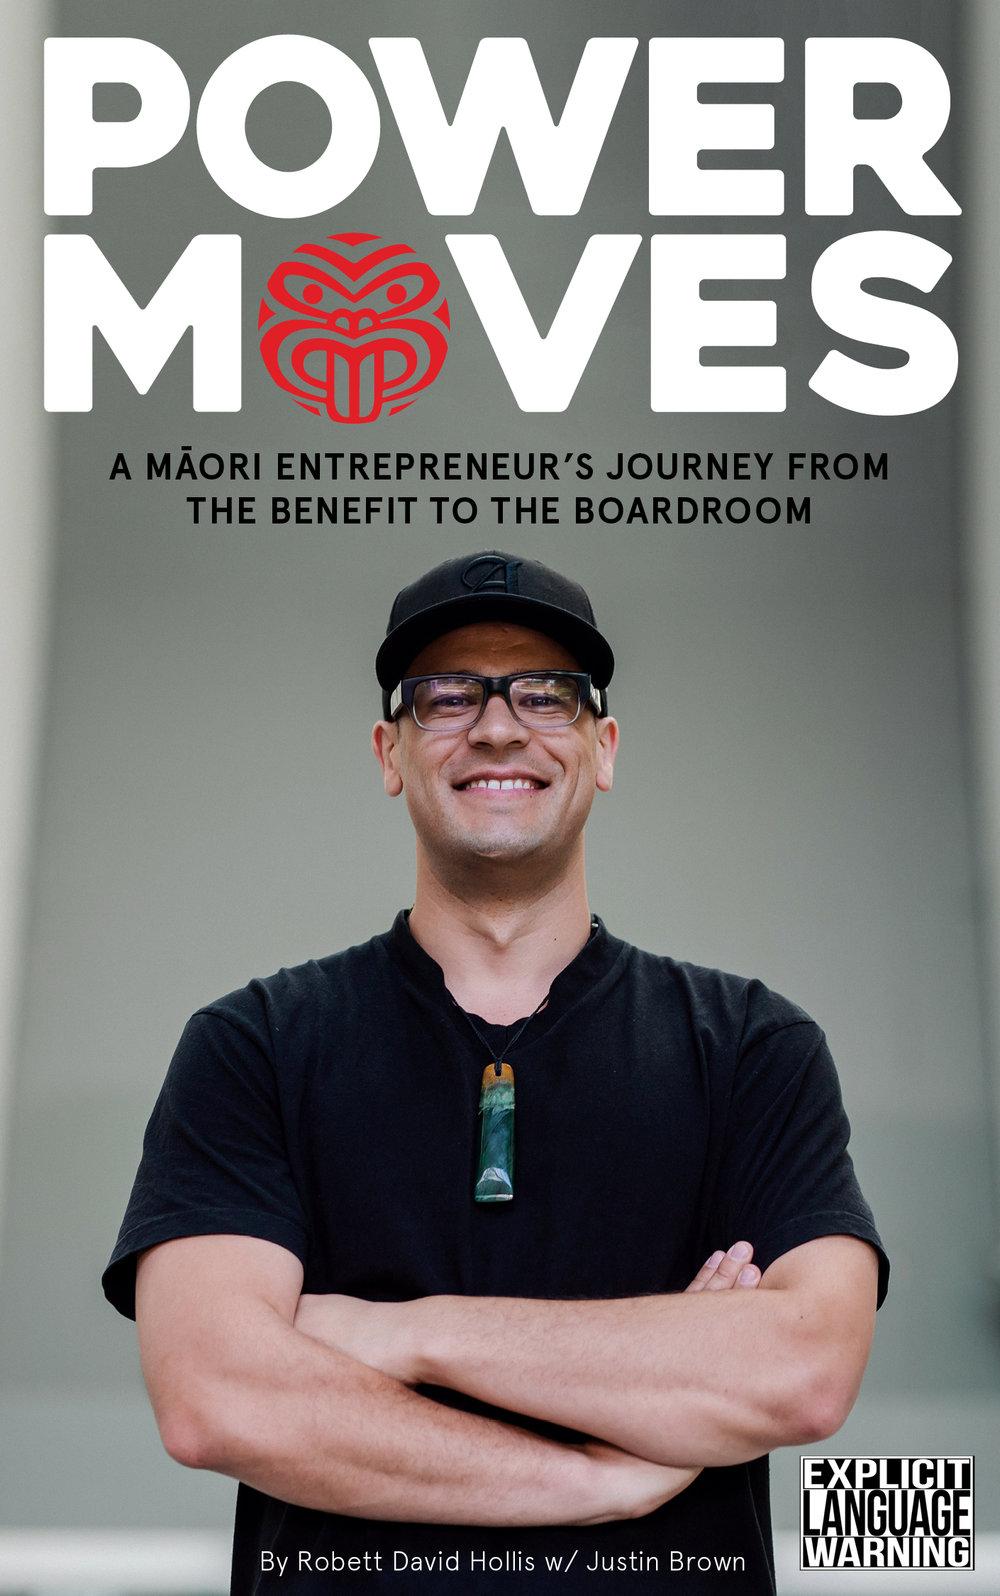 powermoves-e-book-cover-image.jpg